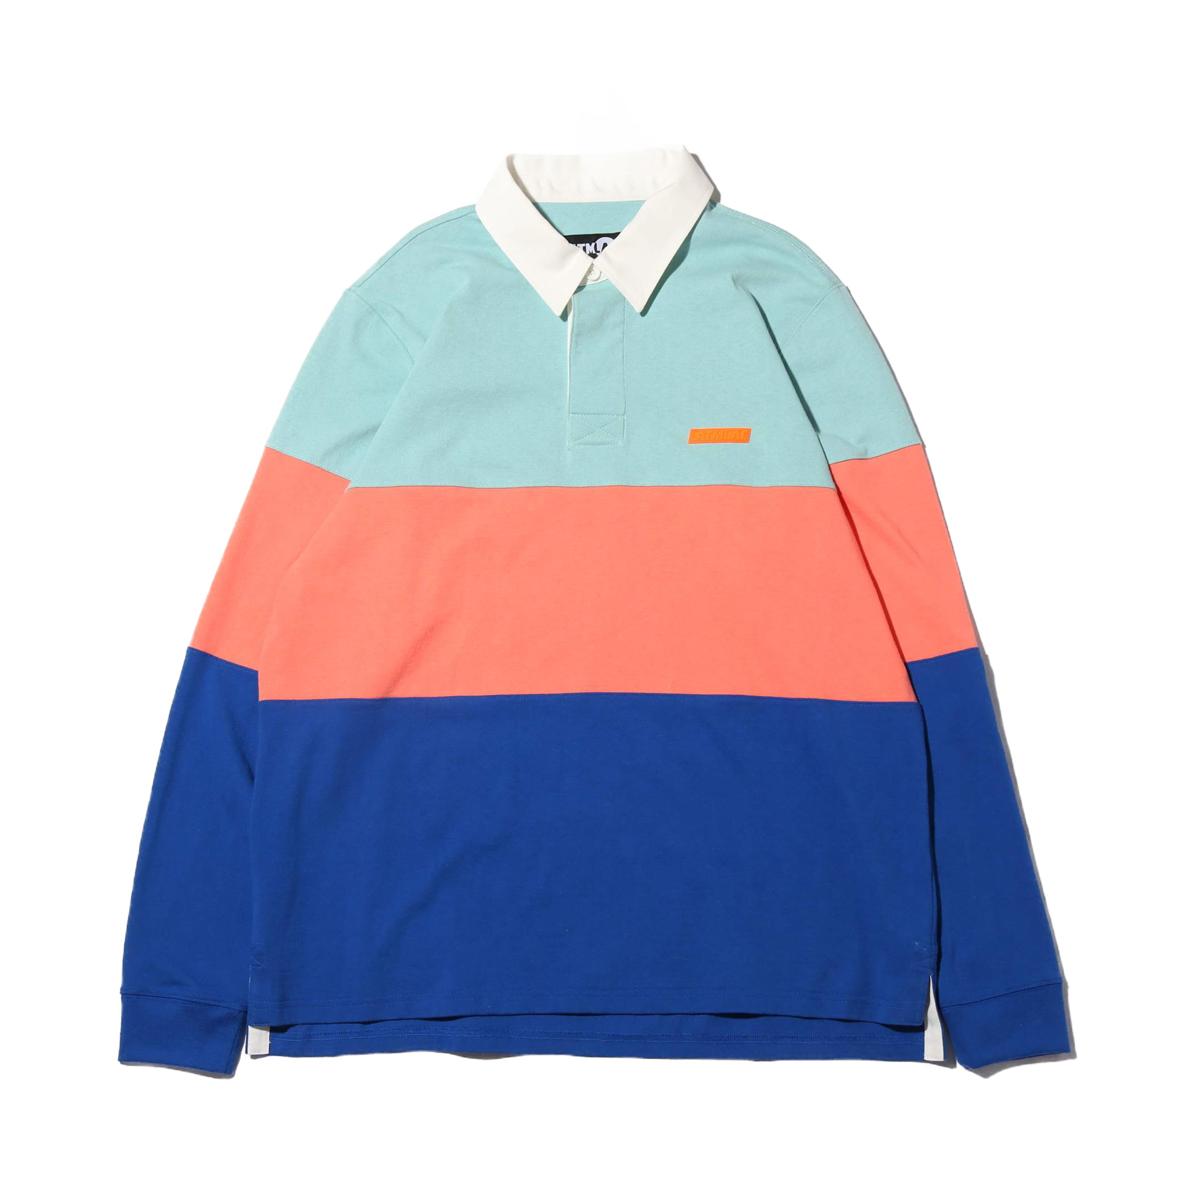 ATMOS LAB RUGBY SHIRT (アトモスラボ ラグビー シャツ)BLUE【メンズ 長袖Tシャツ】19SP-I